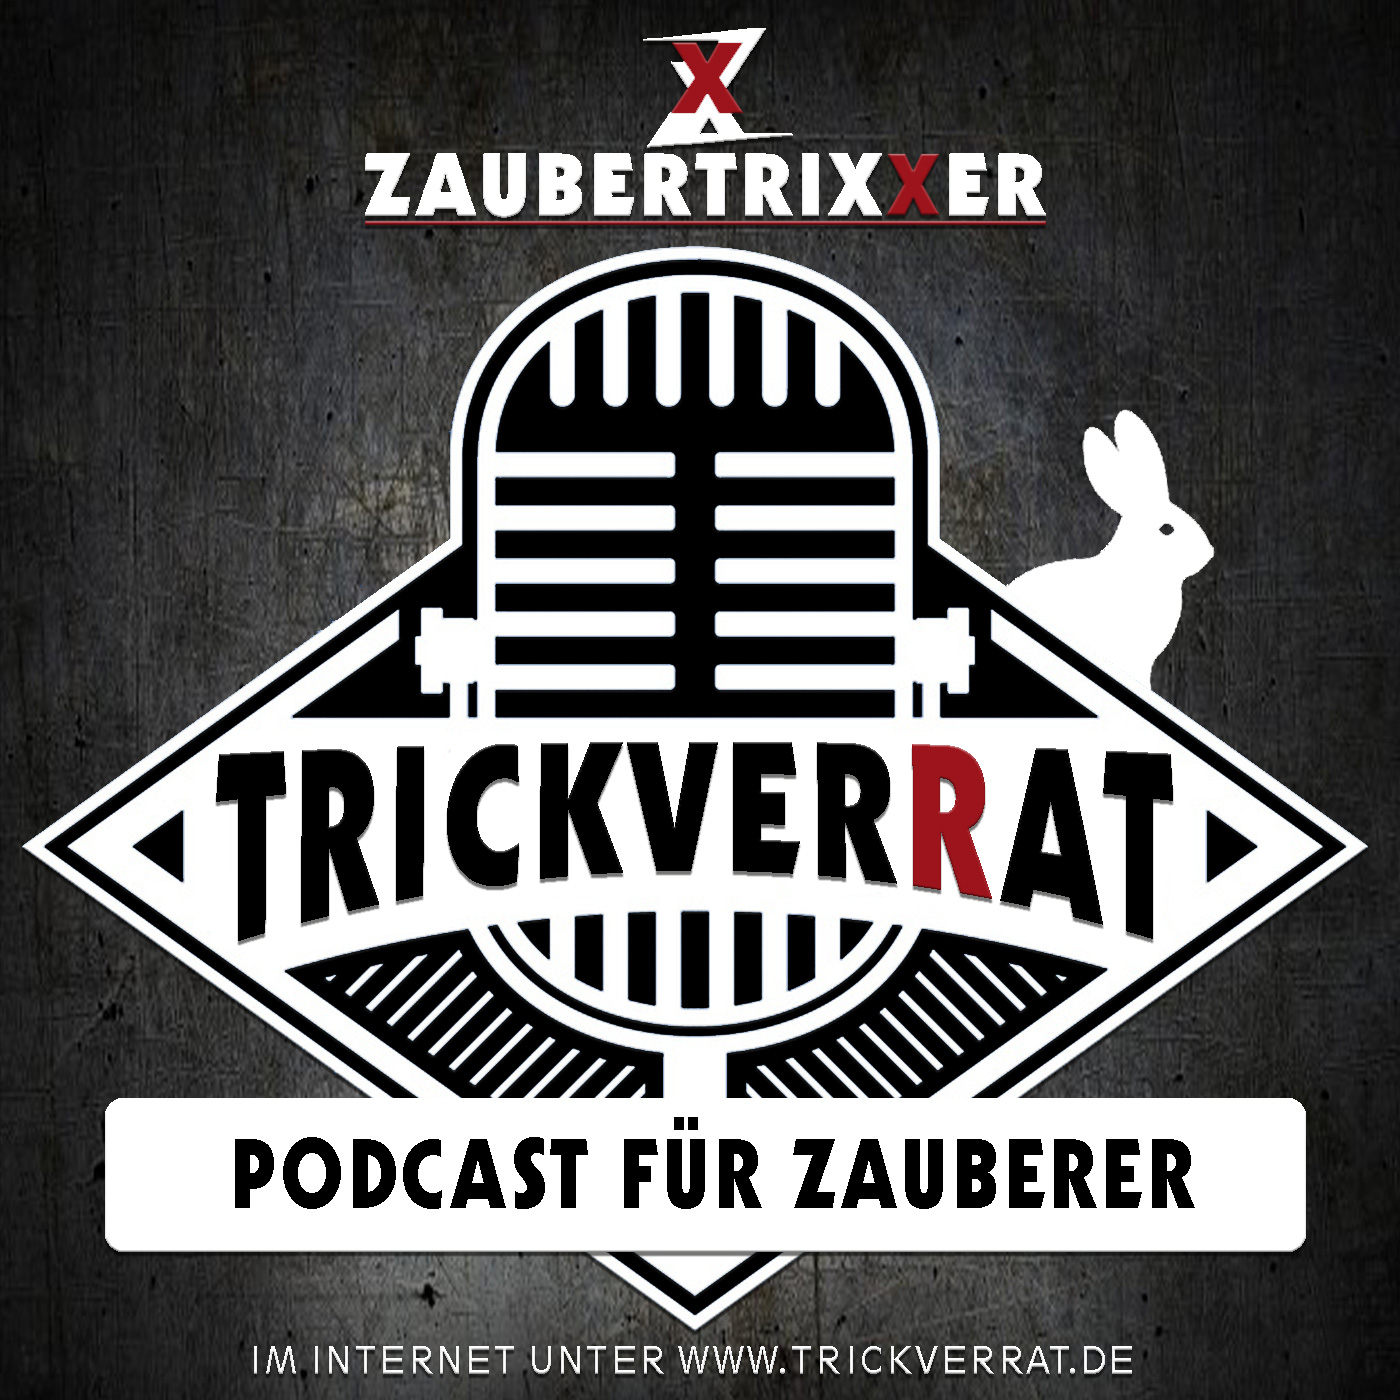 Trickverrat - Podcast für Zauberer logo